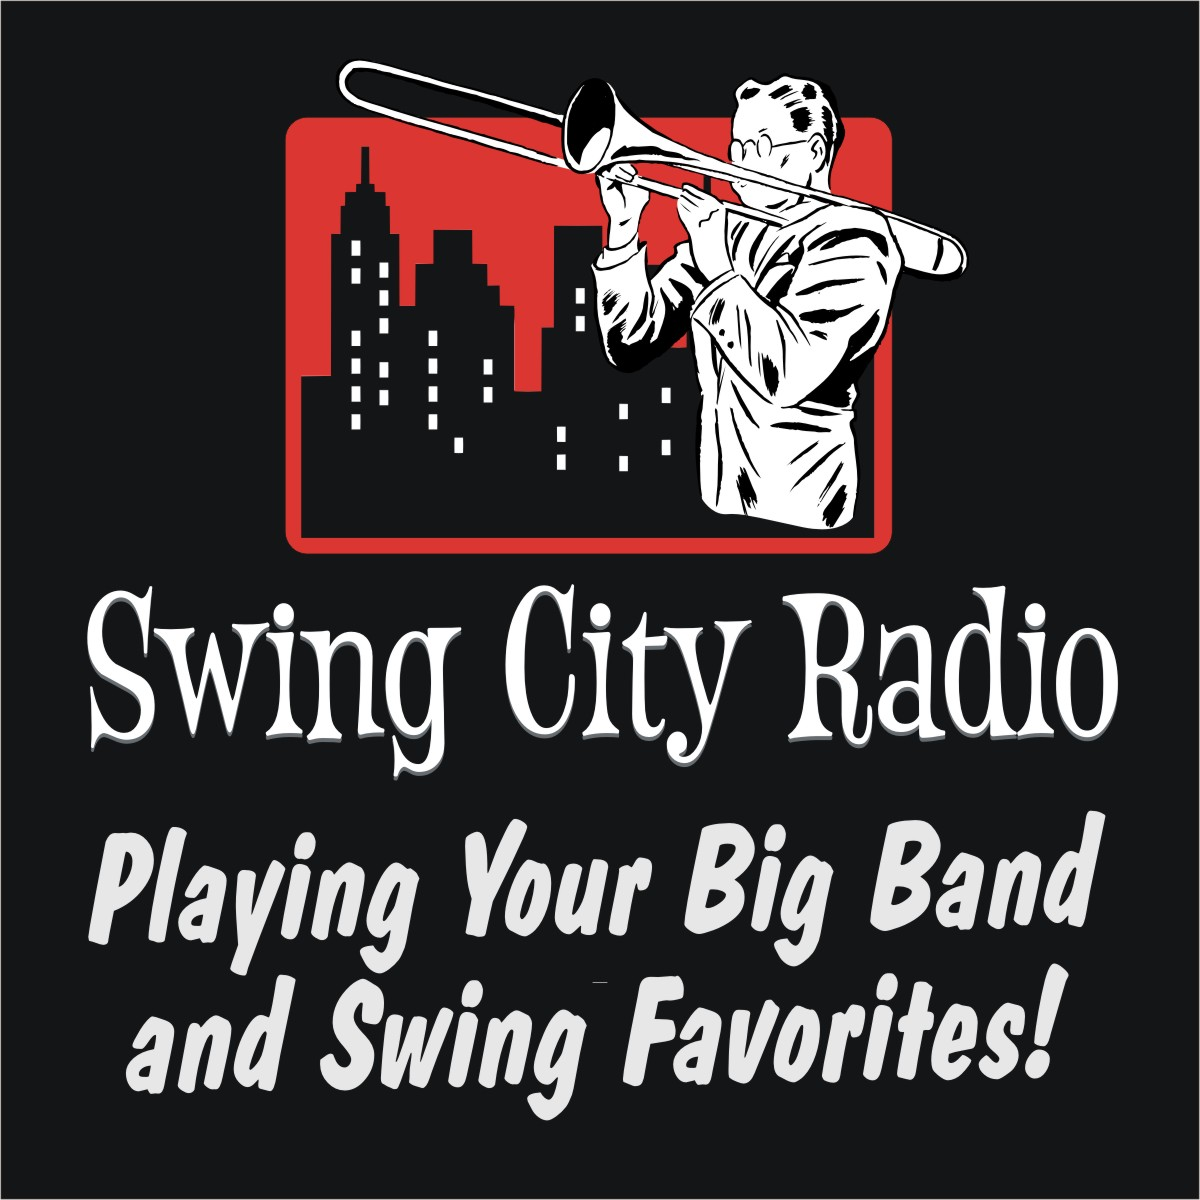 Swing City Radio logo